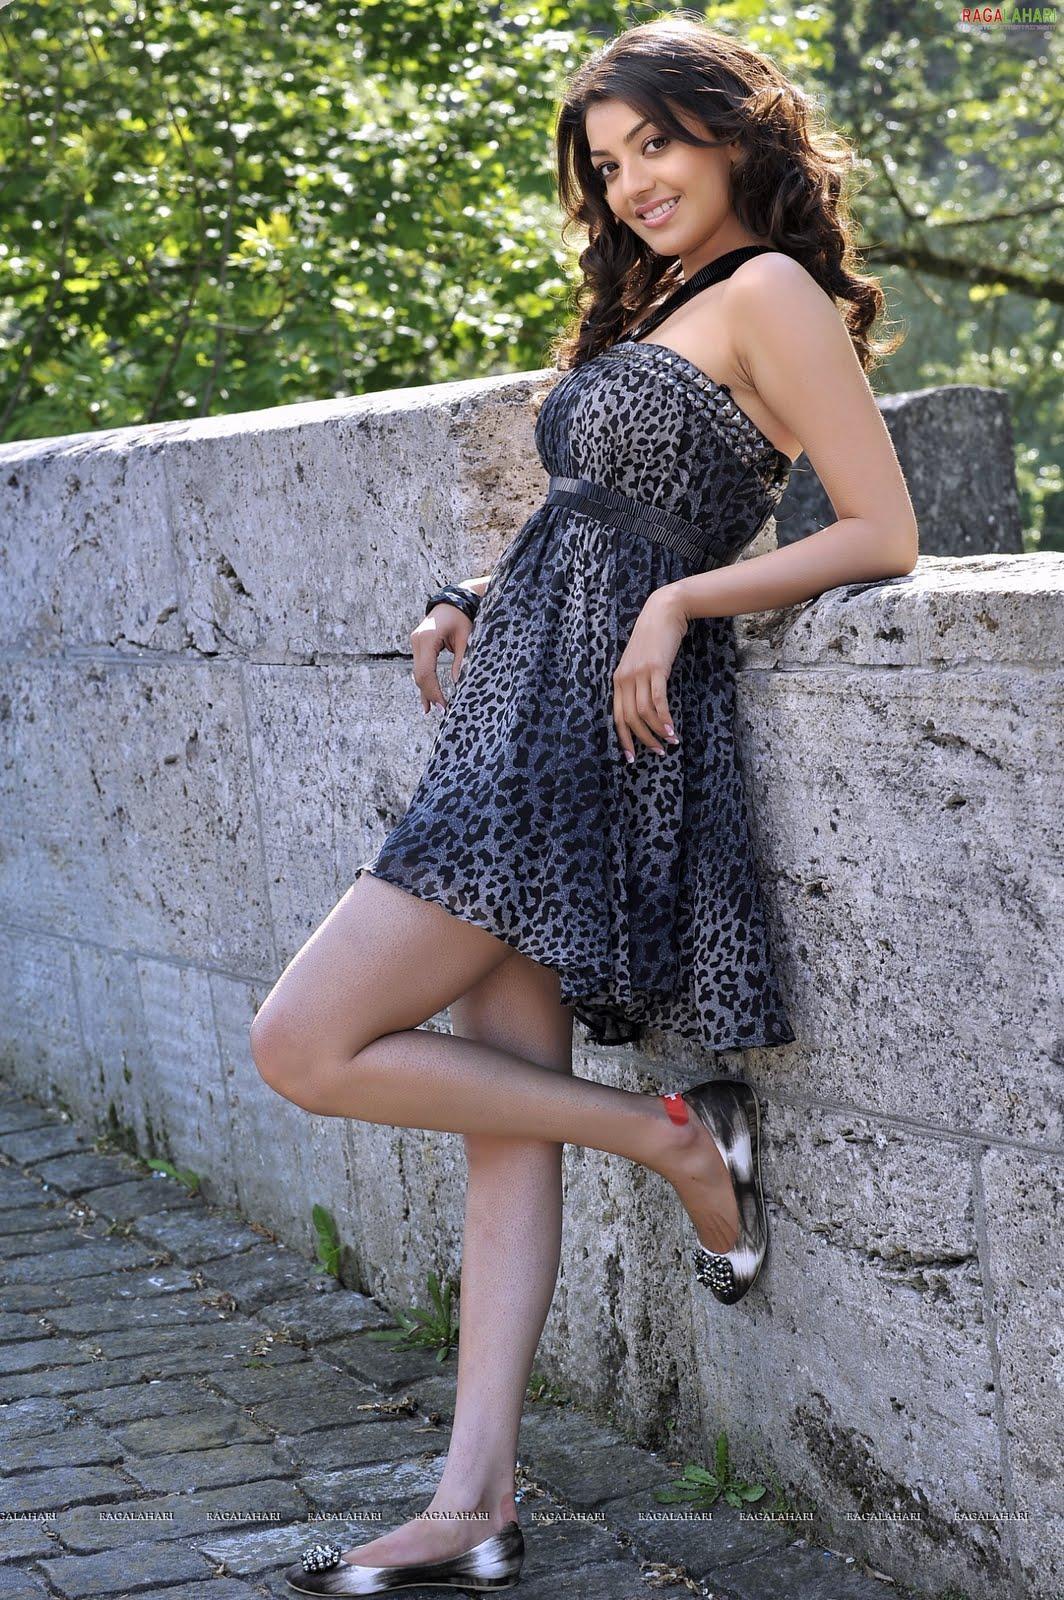 http://1.bp.blogspot.com/-n8qhR7H9R00/TeuUHx04JWI/AAAAAAAAIJ8/SEIiXPknKDU/s1600/veera-heroines-high-resolution4.jpg